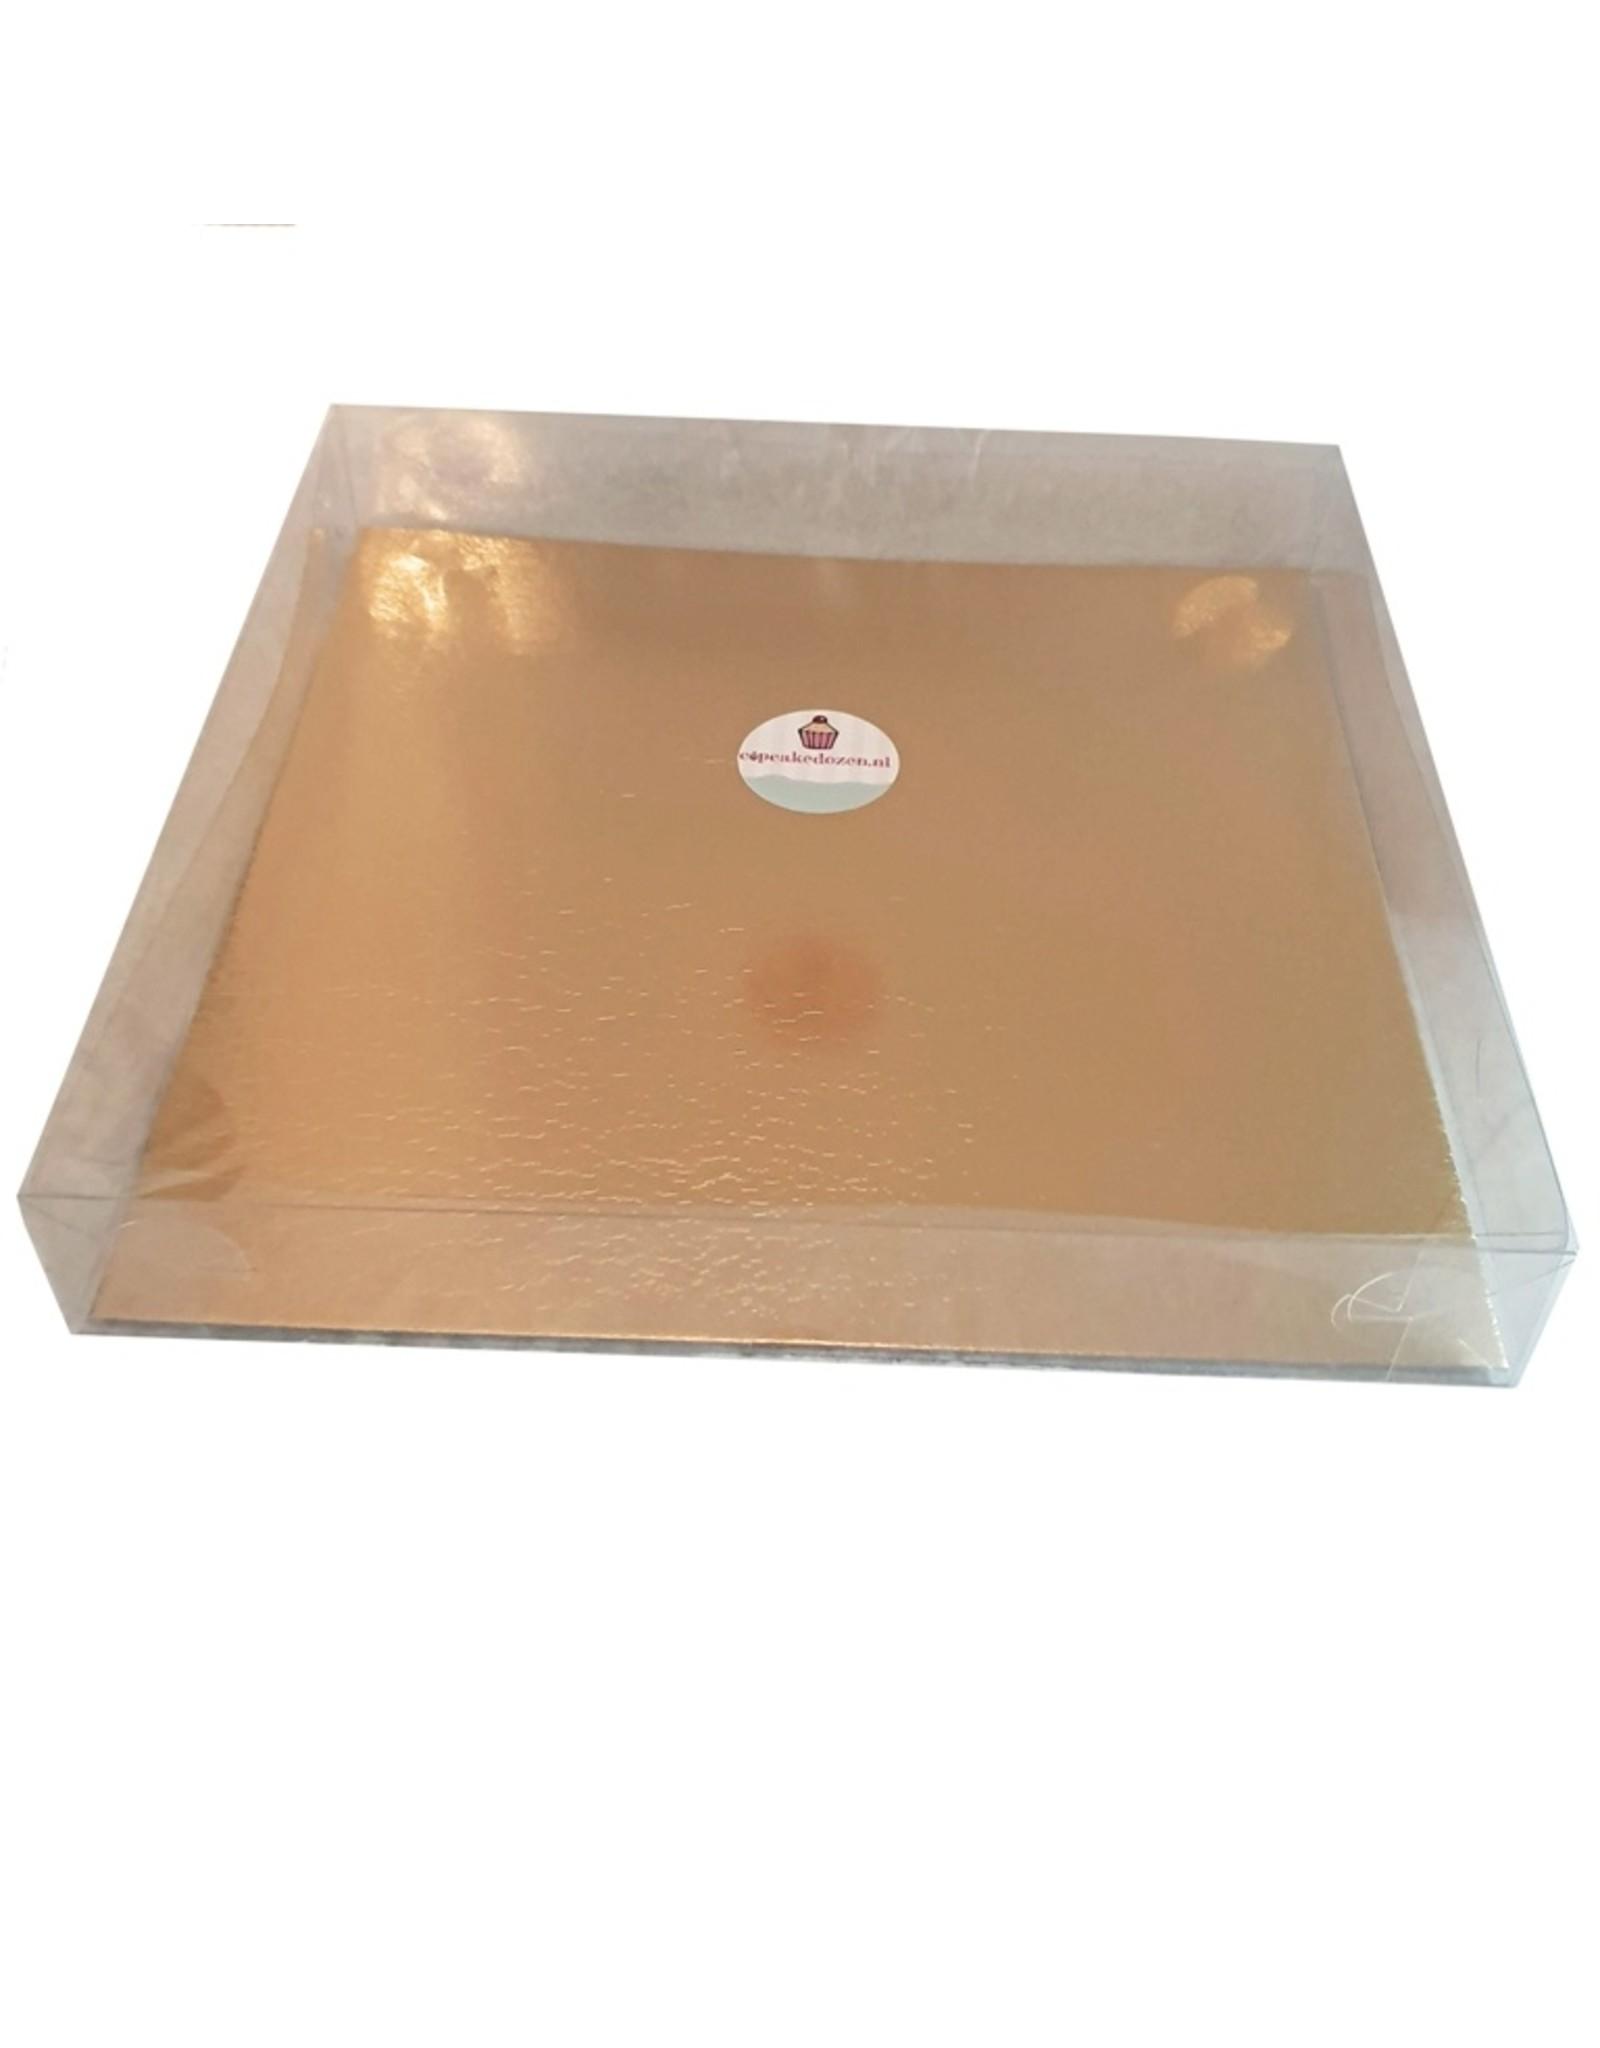 Transparante doos - 29,5 x 29,5 x 4,5-6 cm (per 100 stuks)